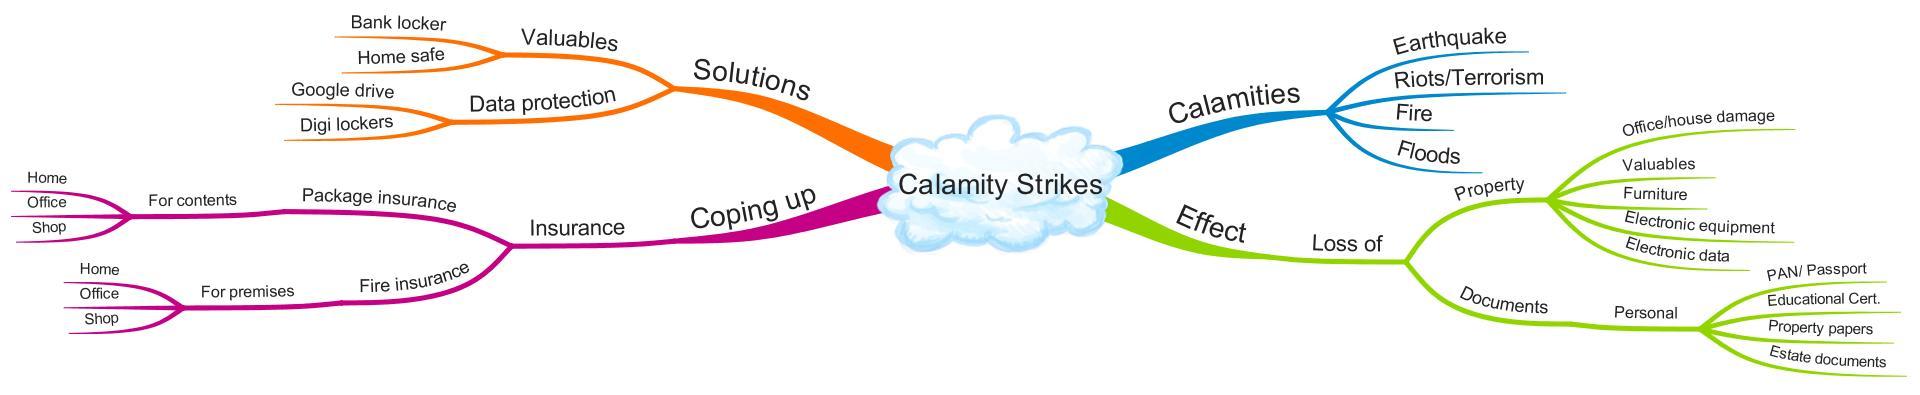 Calamity Strikes